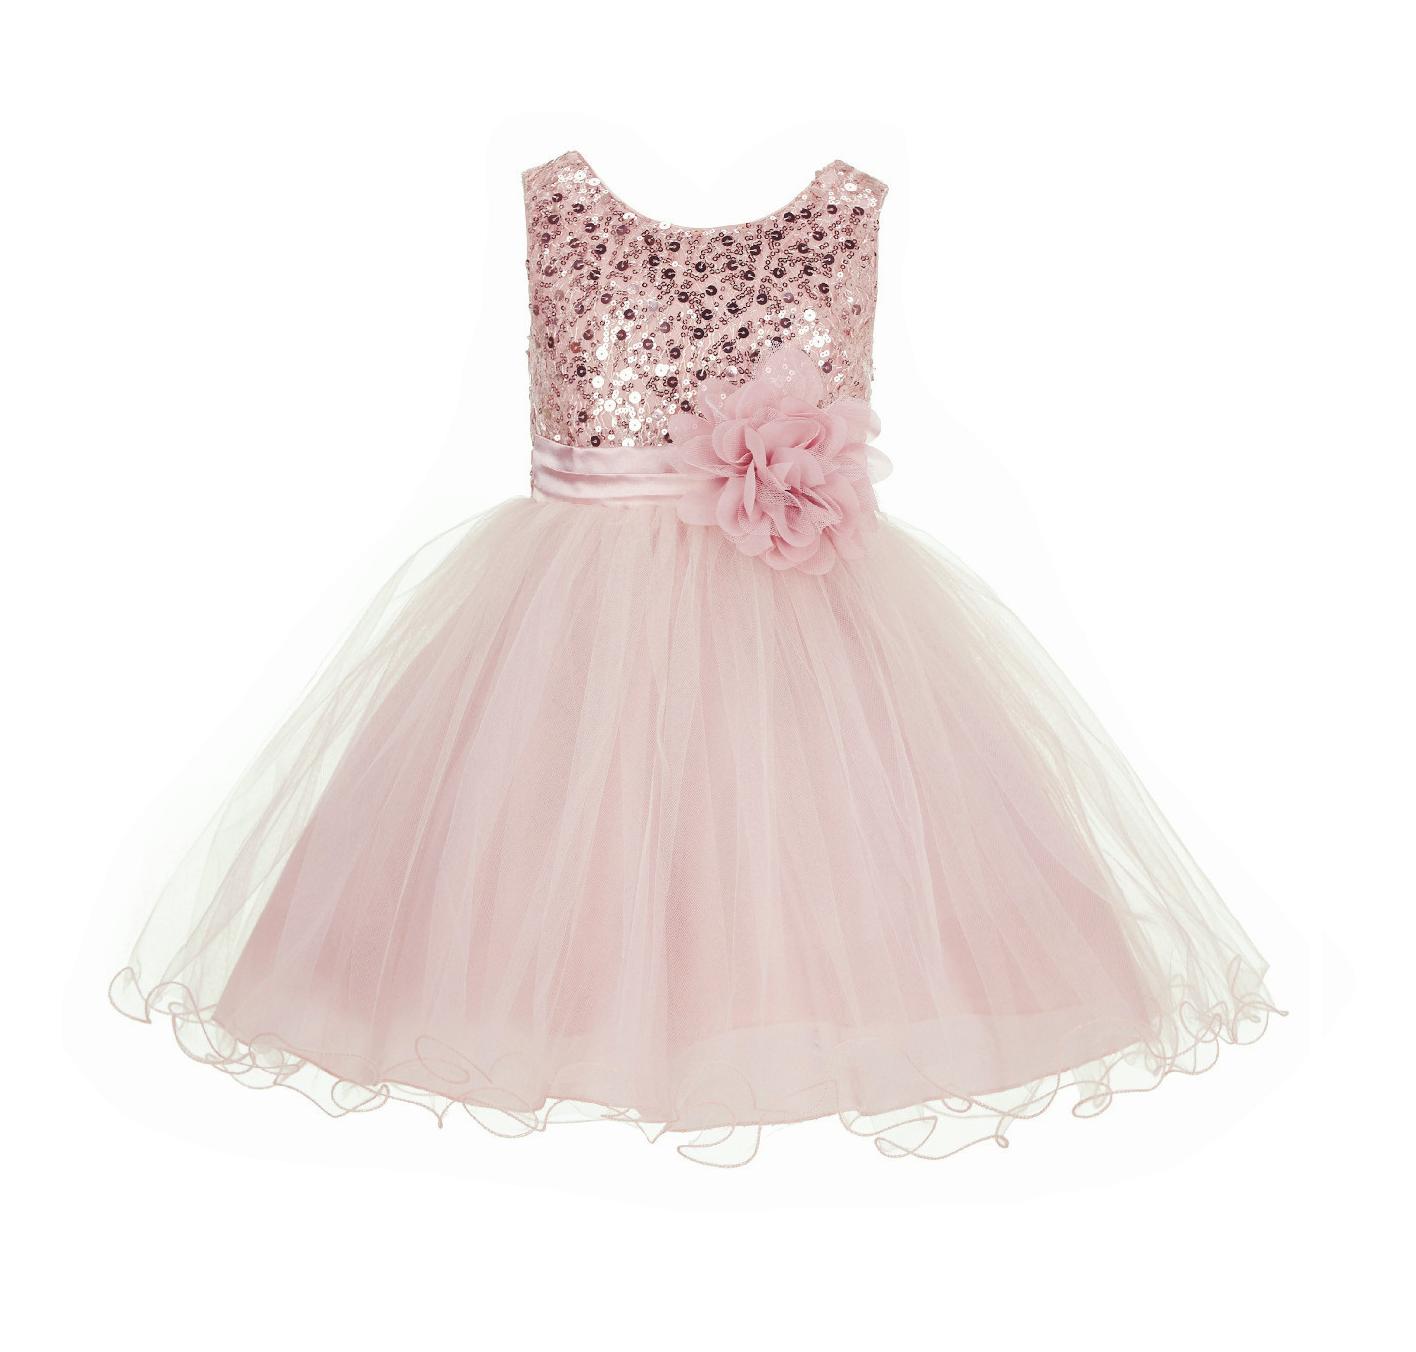 Blush Pink Glitter Sequin Tulle Flower Girl Dress Pretty Princess B